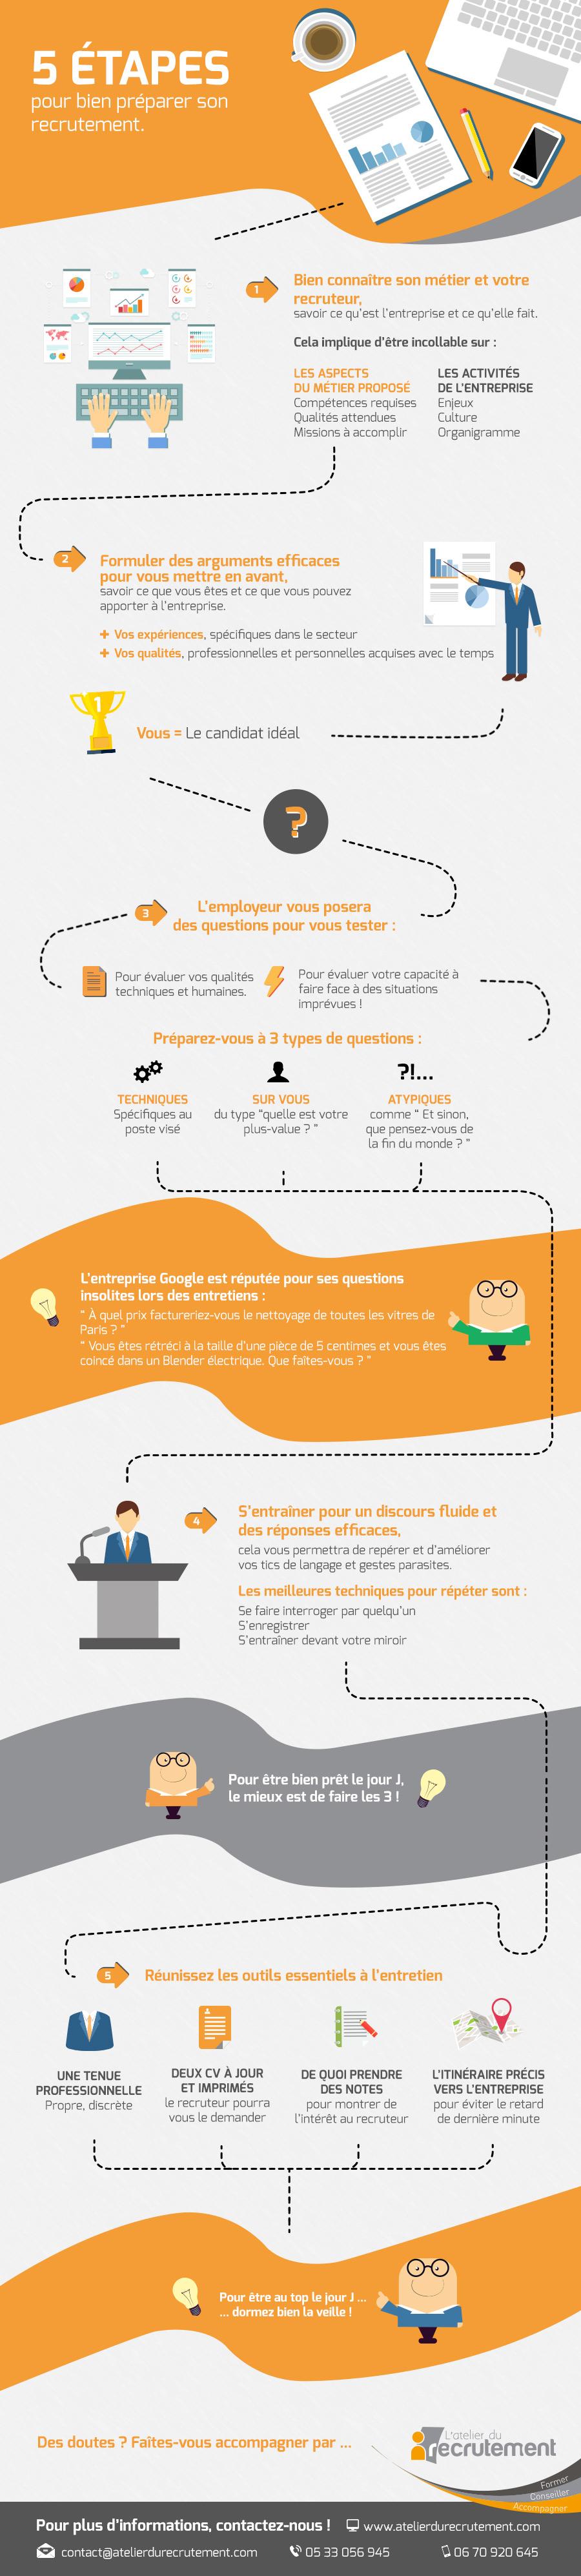 LatelierDuRecrutement_Infographie1